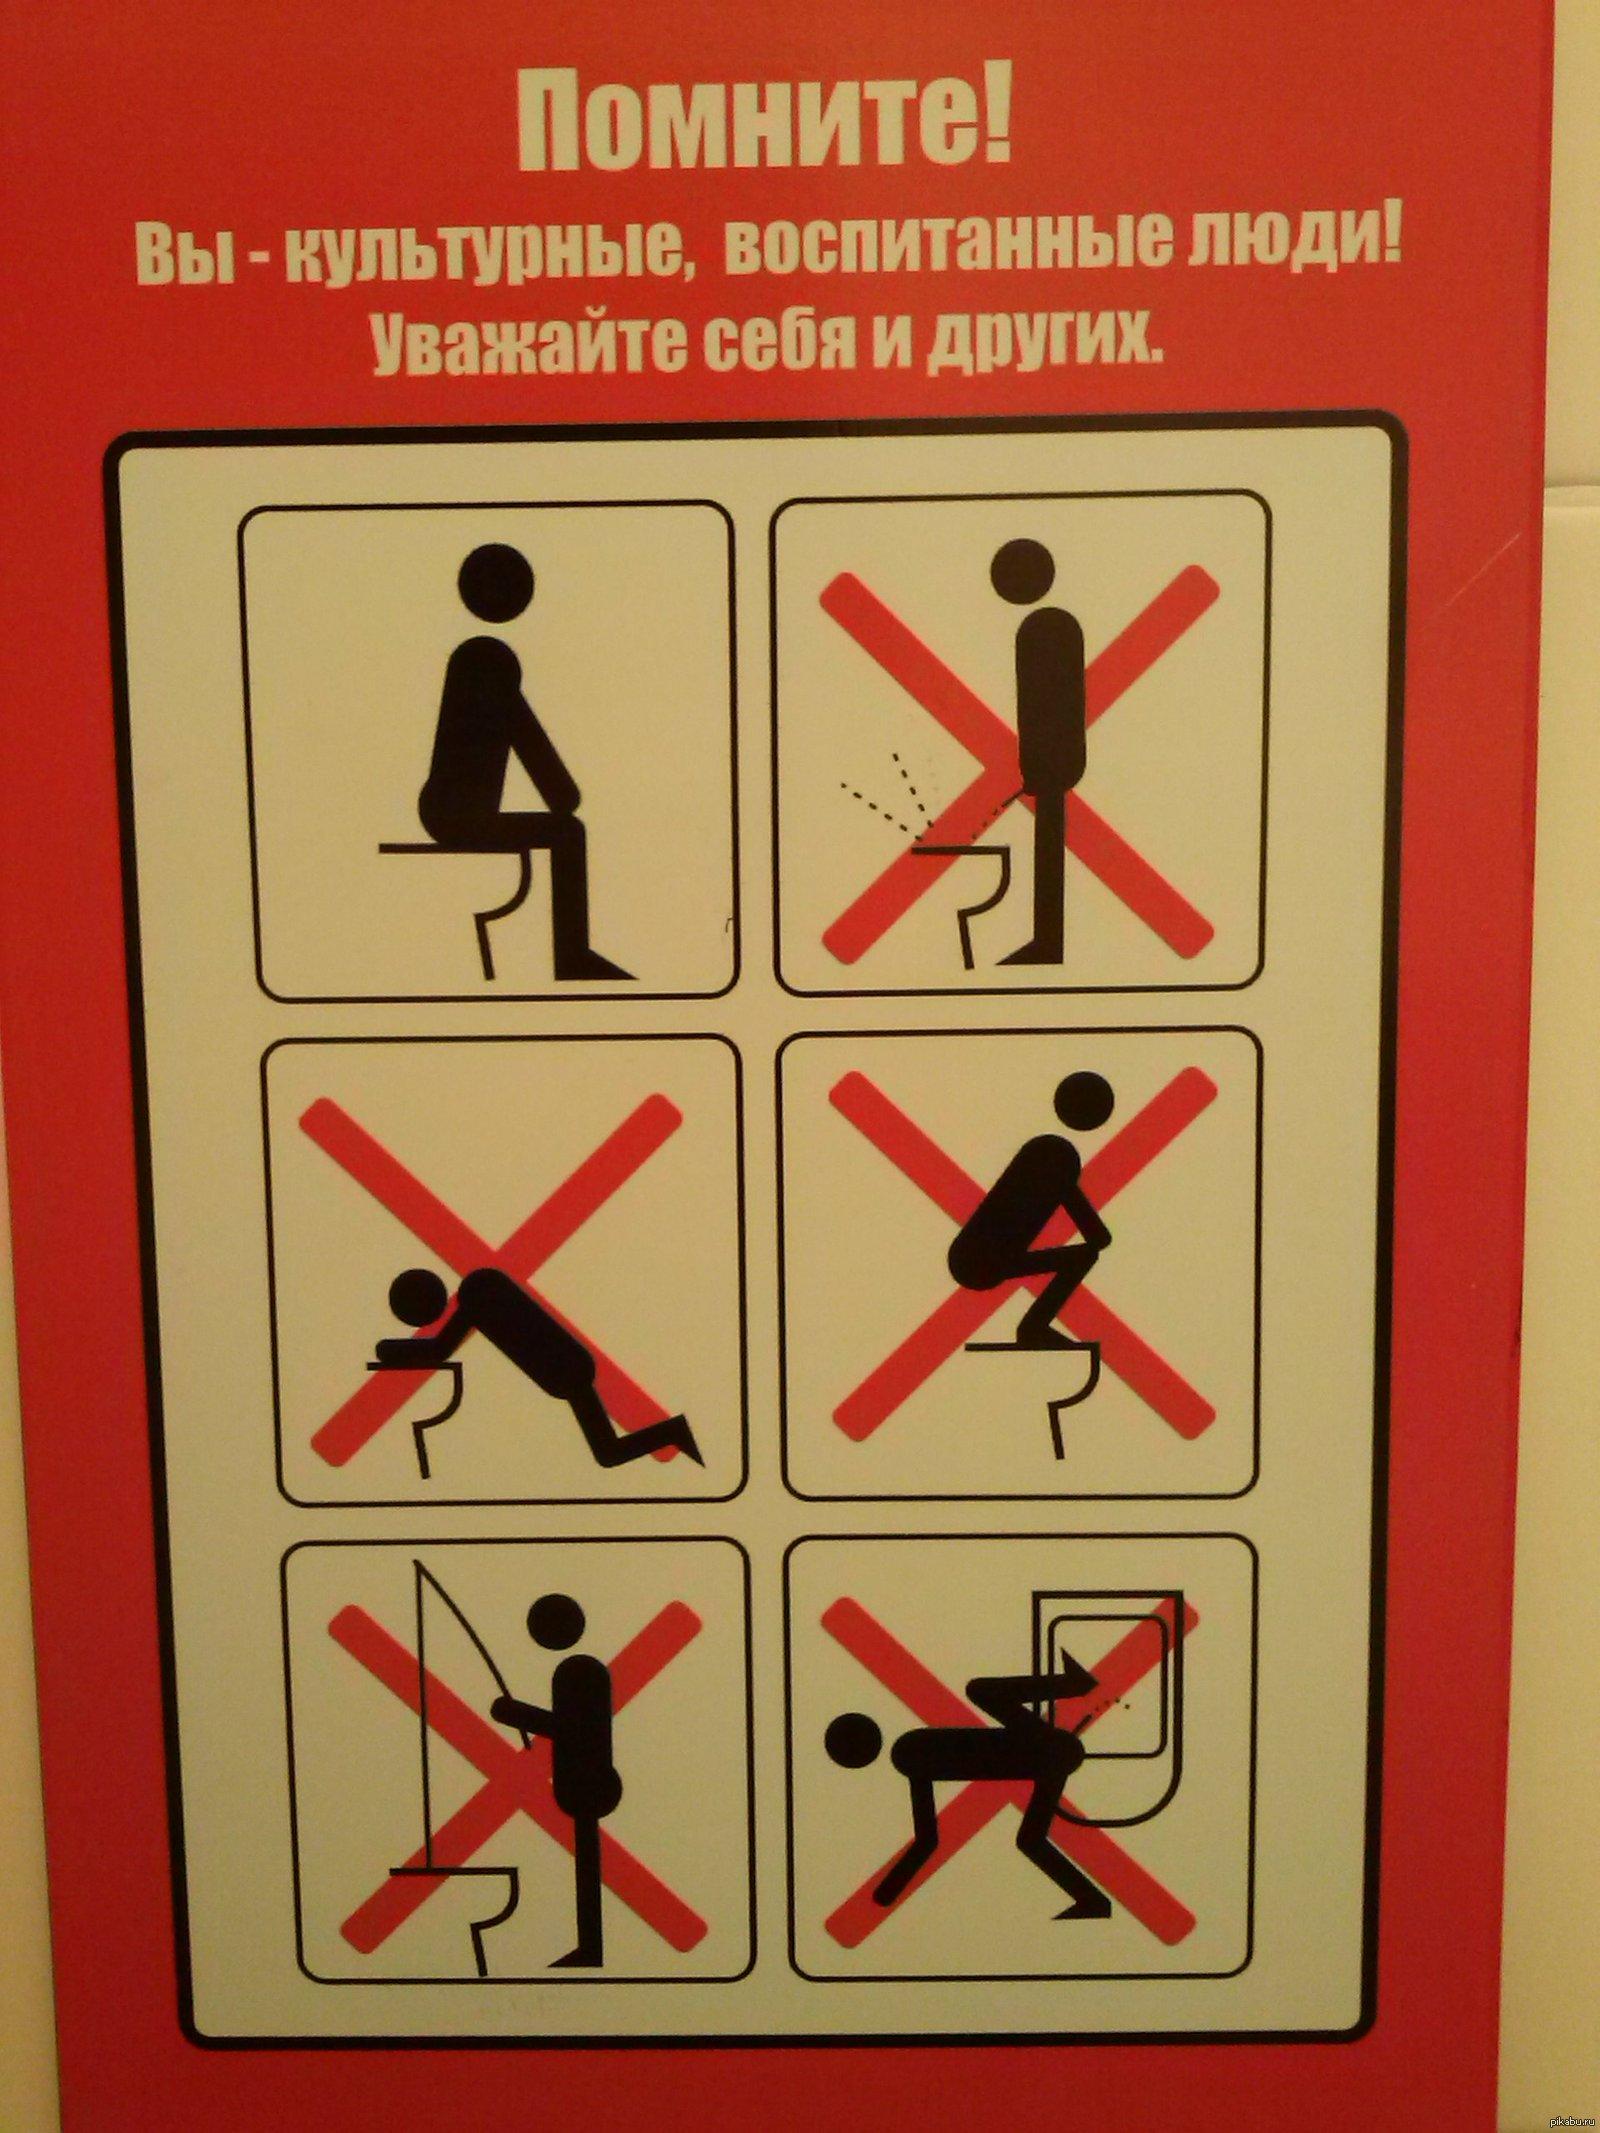 Реклама в туалетах в картинках